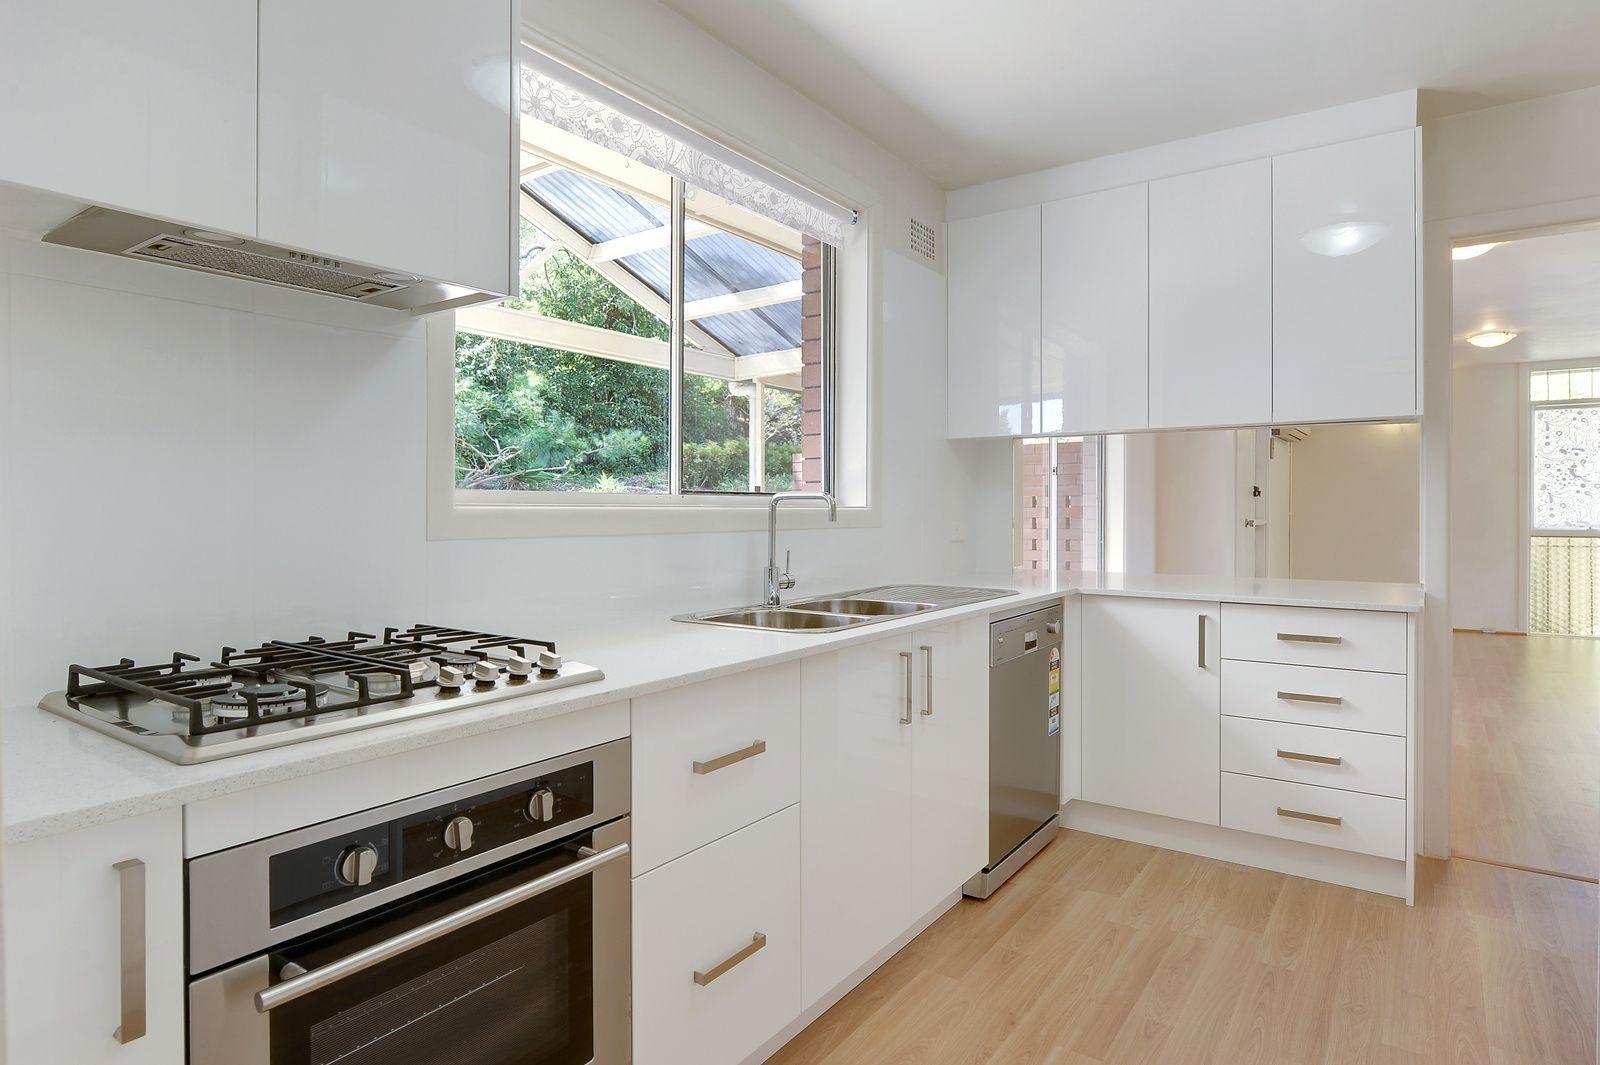 2/16 Carcoola Crescent, Normanhurst NSW 2076, Image 1